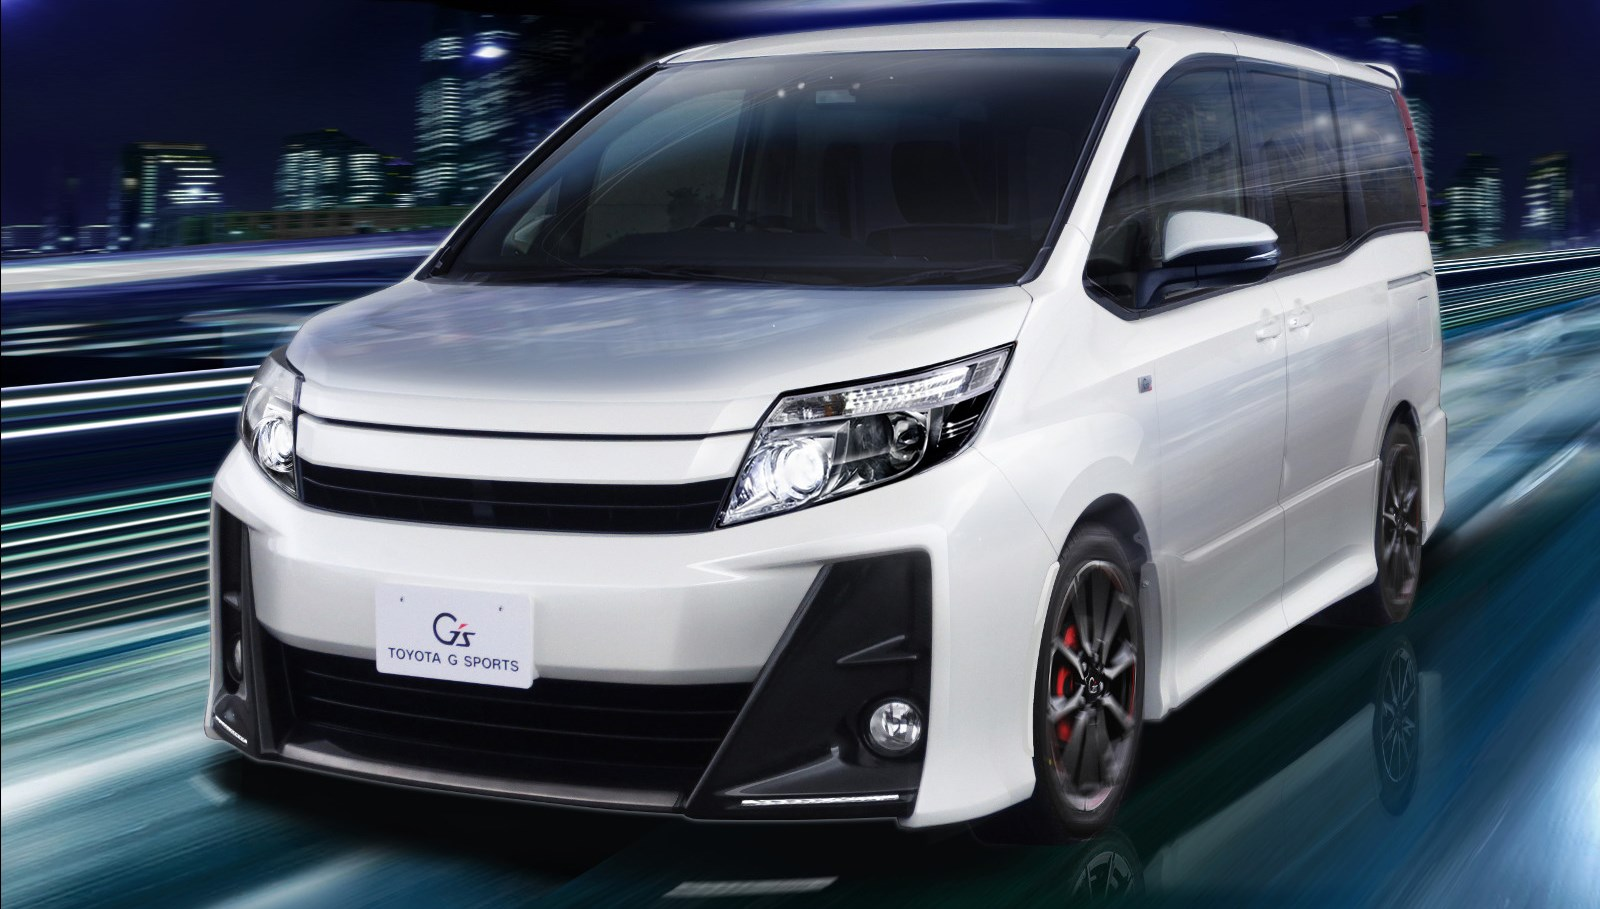 Toyota Noah G's and Voxy G's concepts - Vehiclejar Blog